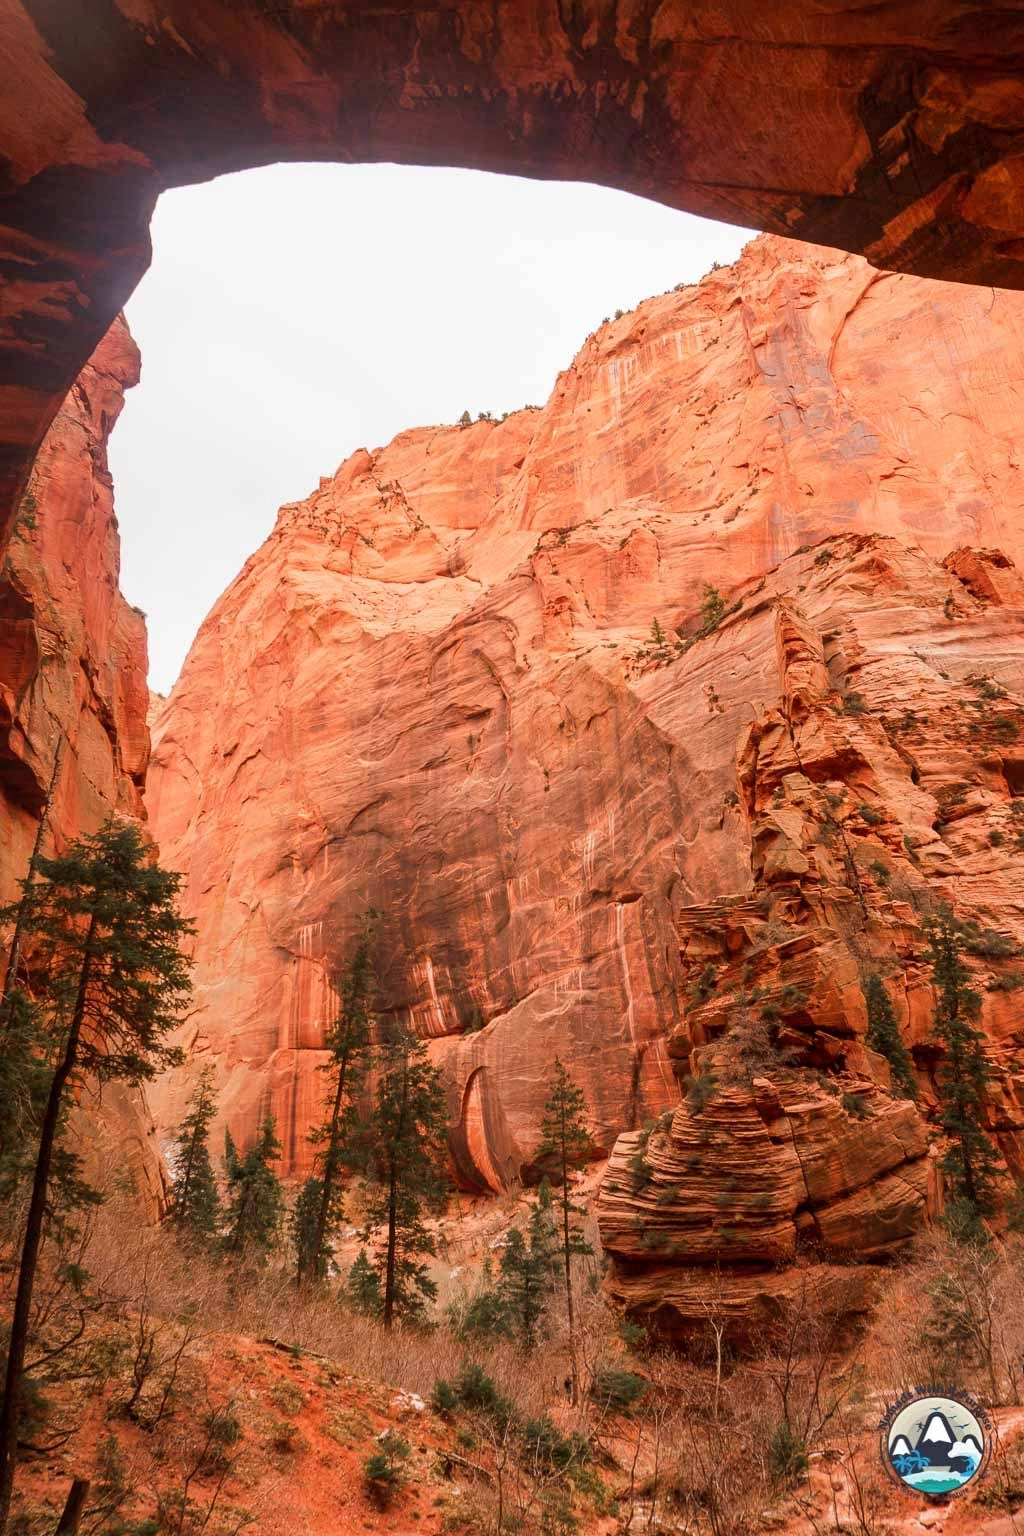 Middle Fork destination of Kolob Canyon, Zion